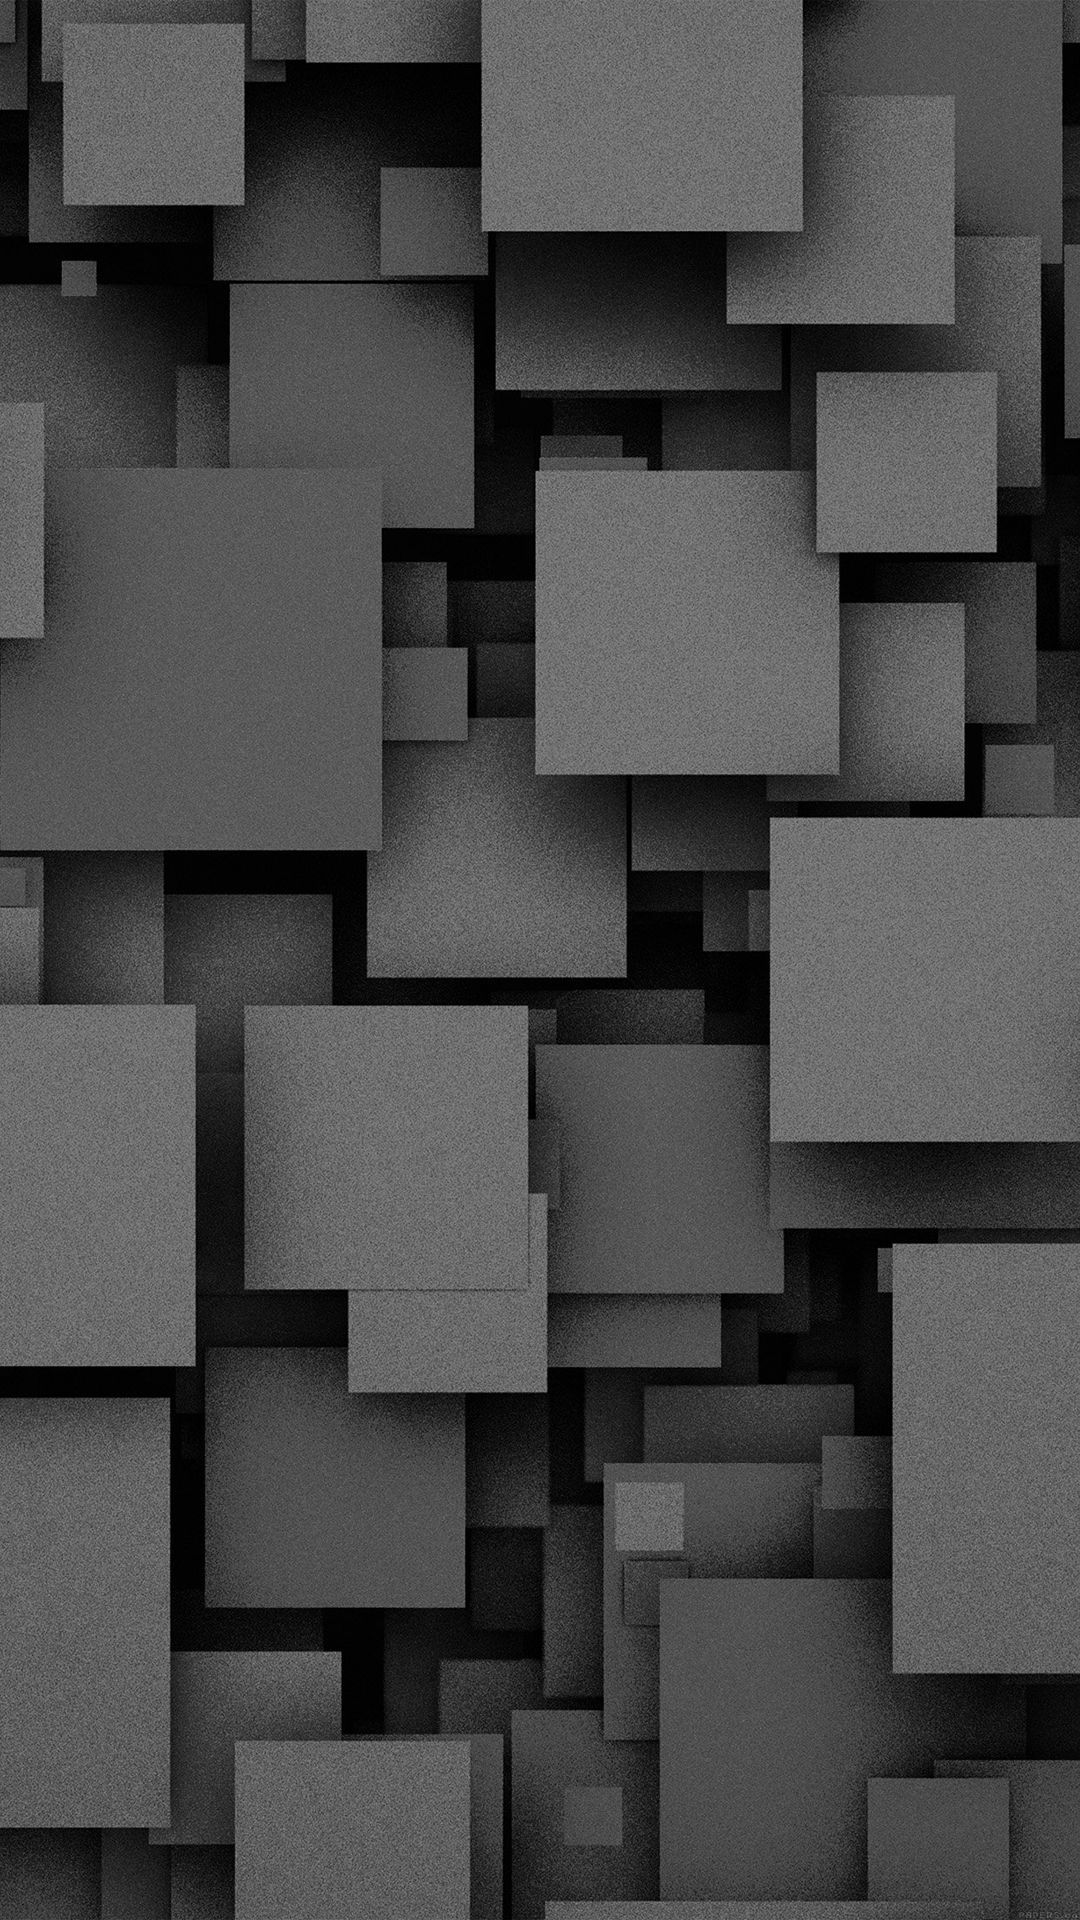 Minimalist Black Squares Wallpapers Top Free Minimalist Black